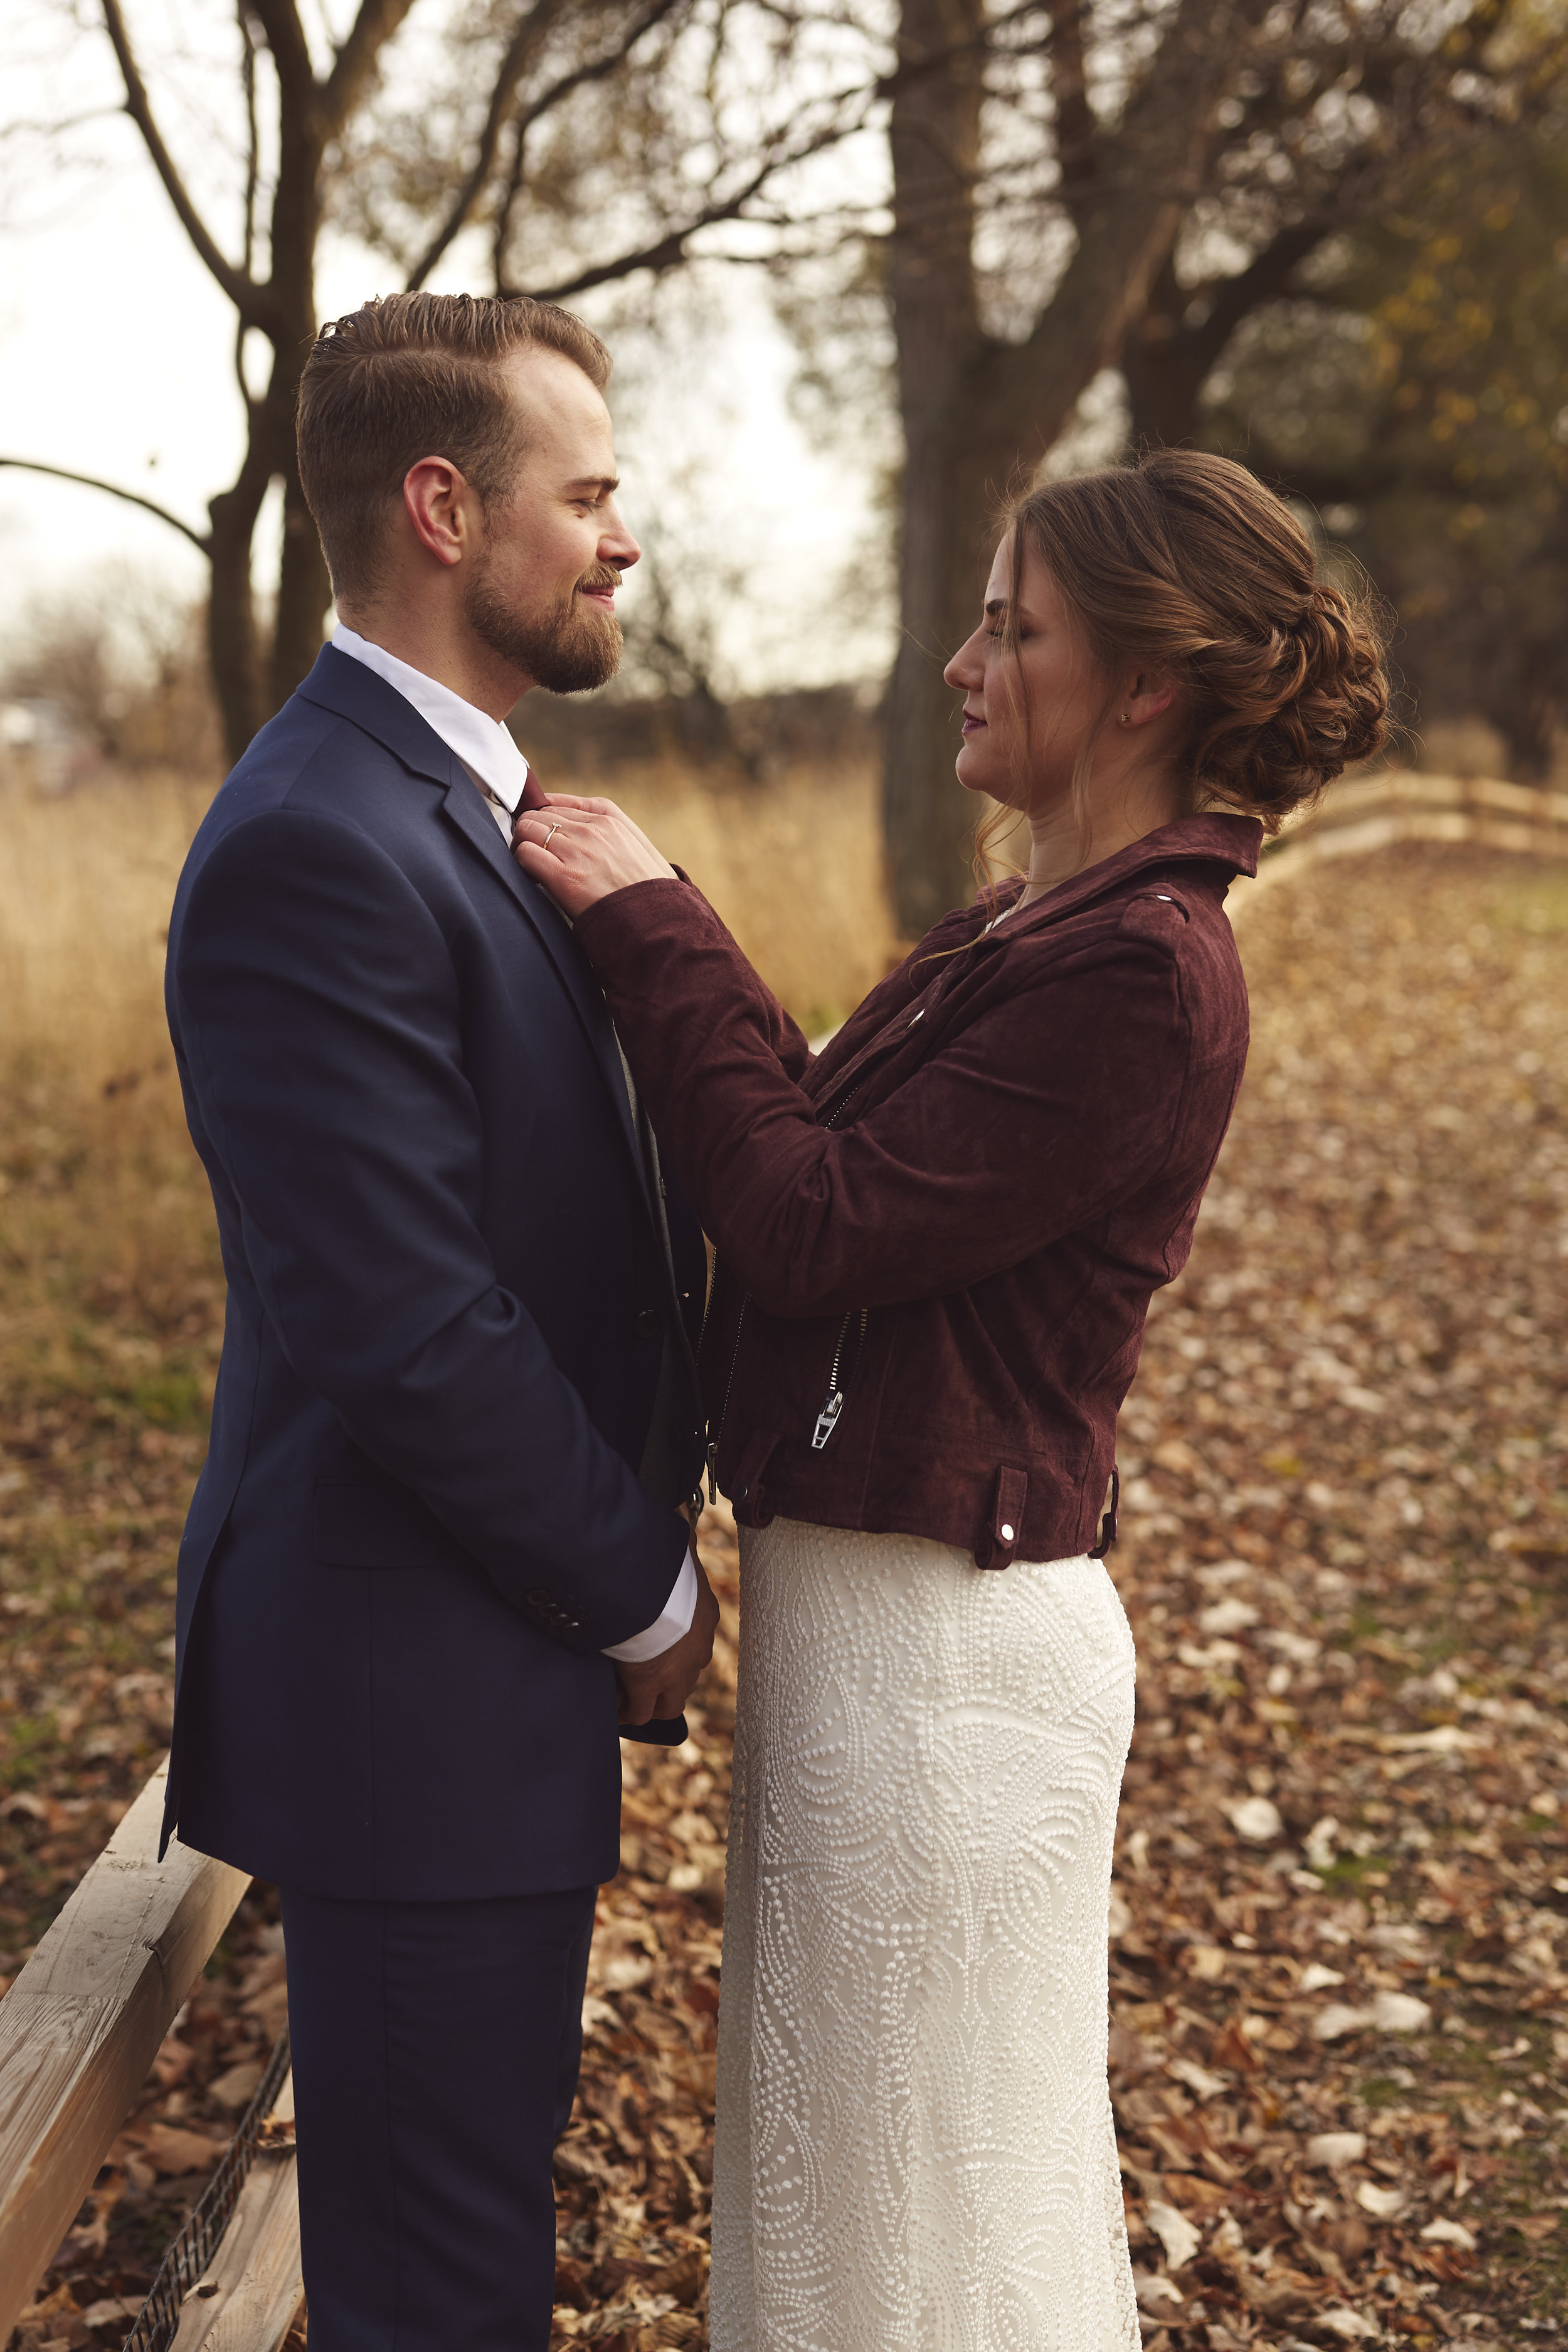 Jen & Ben Wedding - benromangphoto - 6I5A9967.jpg